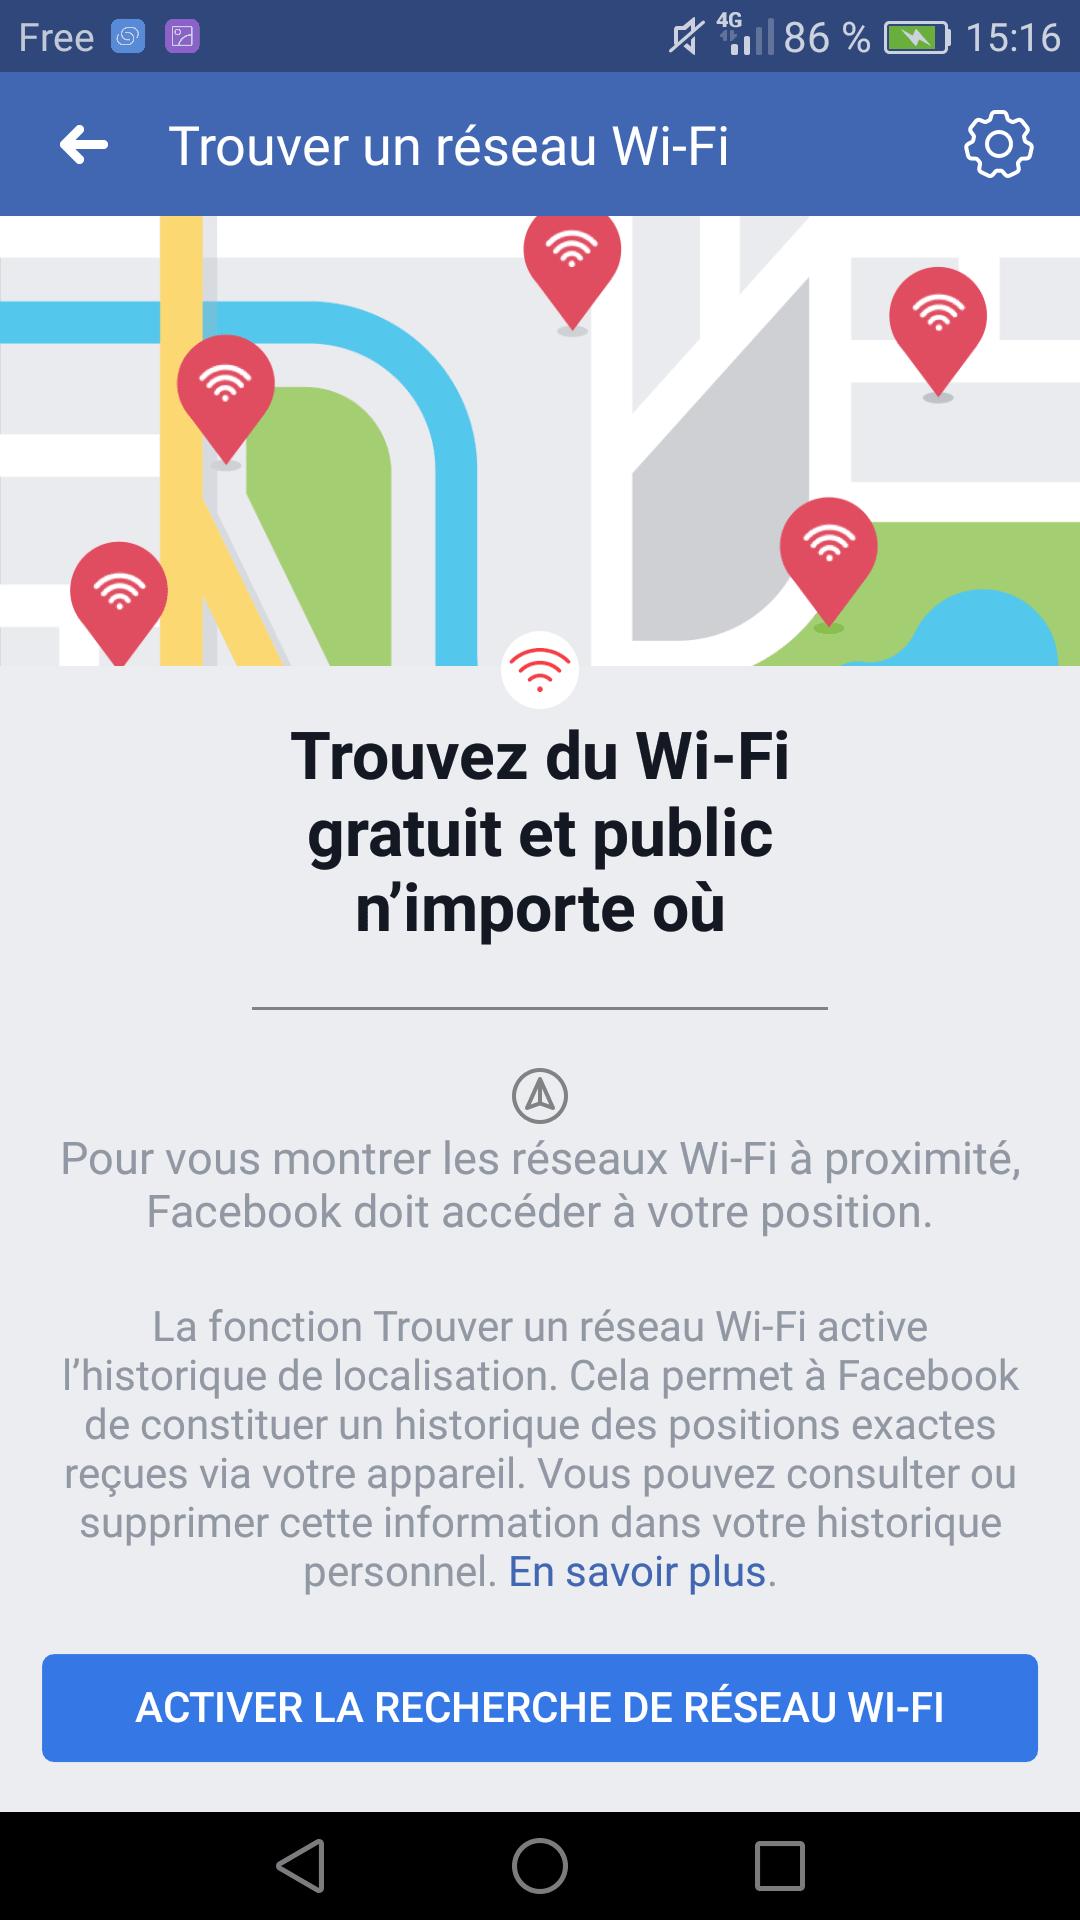 Trouver WiFi gratuit avec Facebook